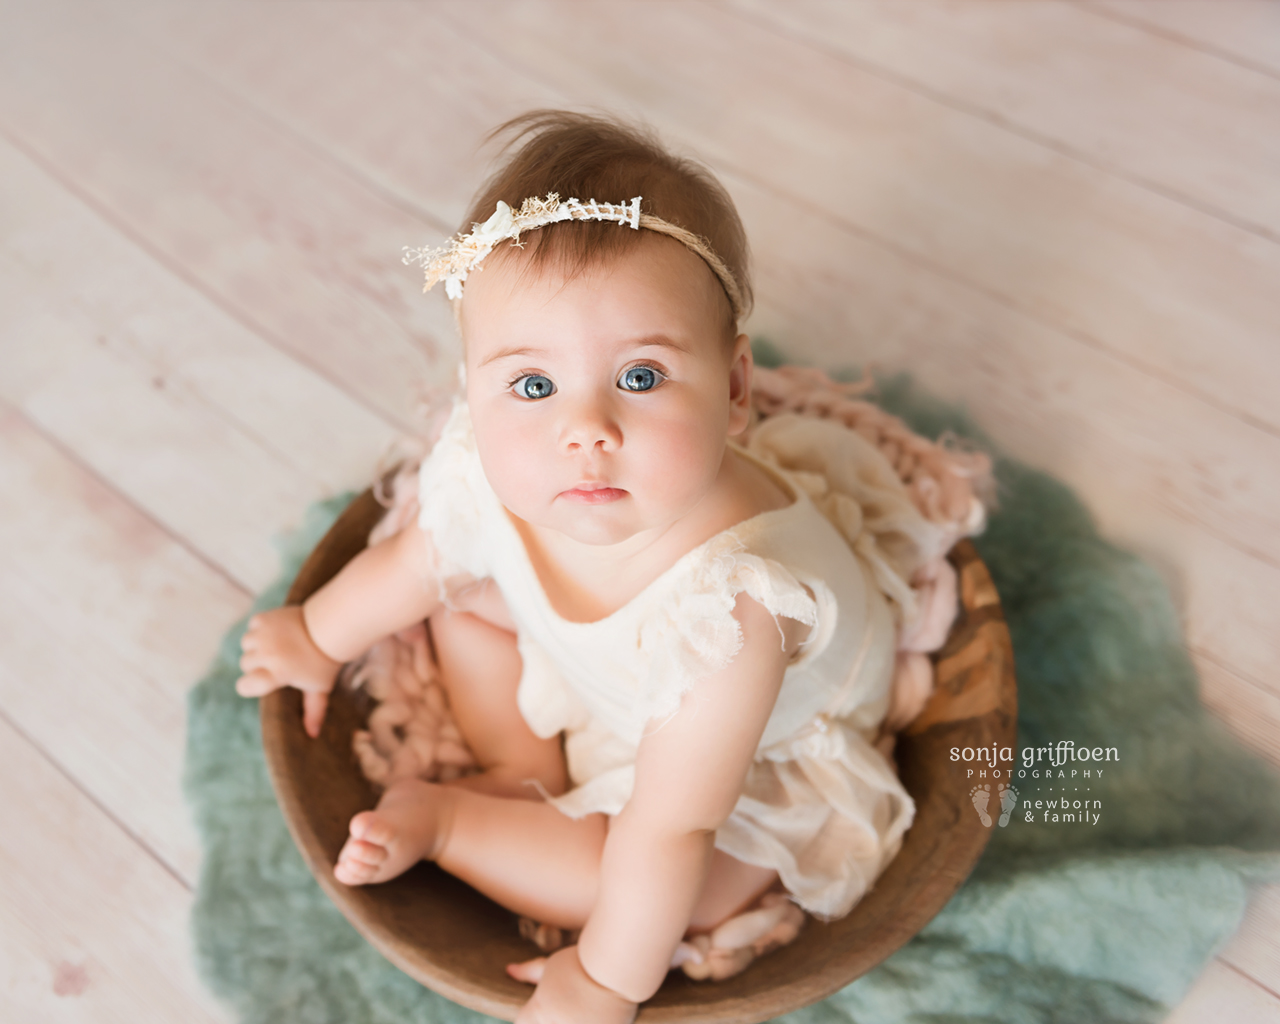 Thalia-Milestone-Brisbane-Newborn-Photographer-Sonja-Griffioen-11.jpg